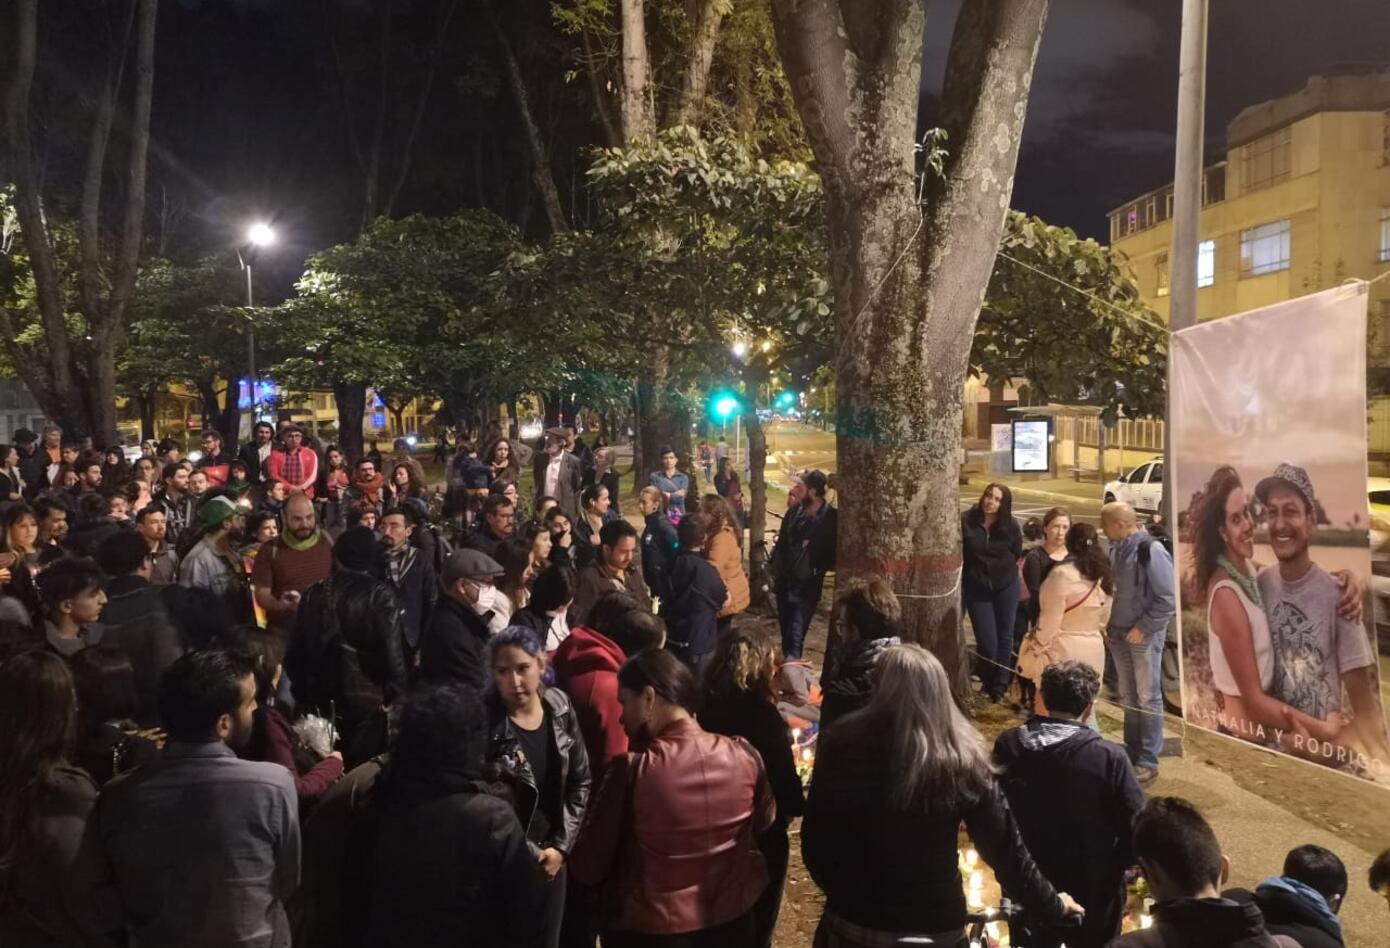 Así fue el homenaje a Nathalia Jiménez y Rodrigo Monsalve en Bogotá